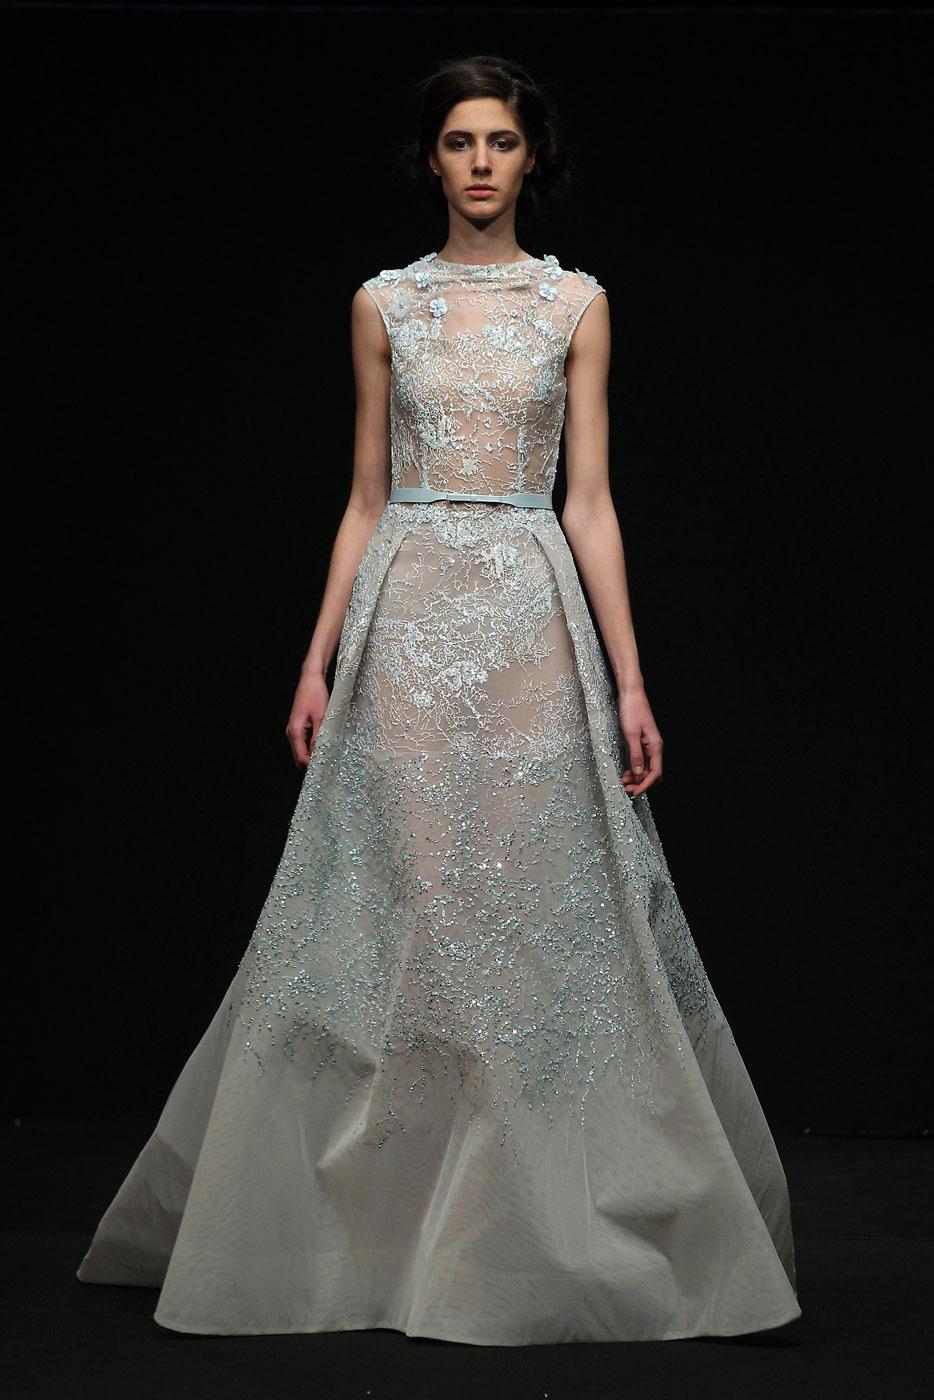 Abed-Mahfouz-fashion-runway-show-haute-couture-paris-spring-2015-the-impression-10